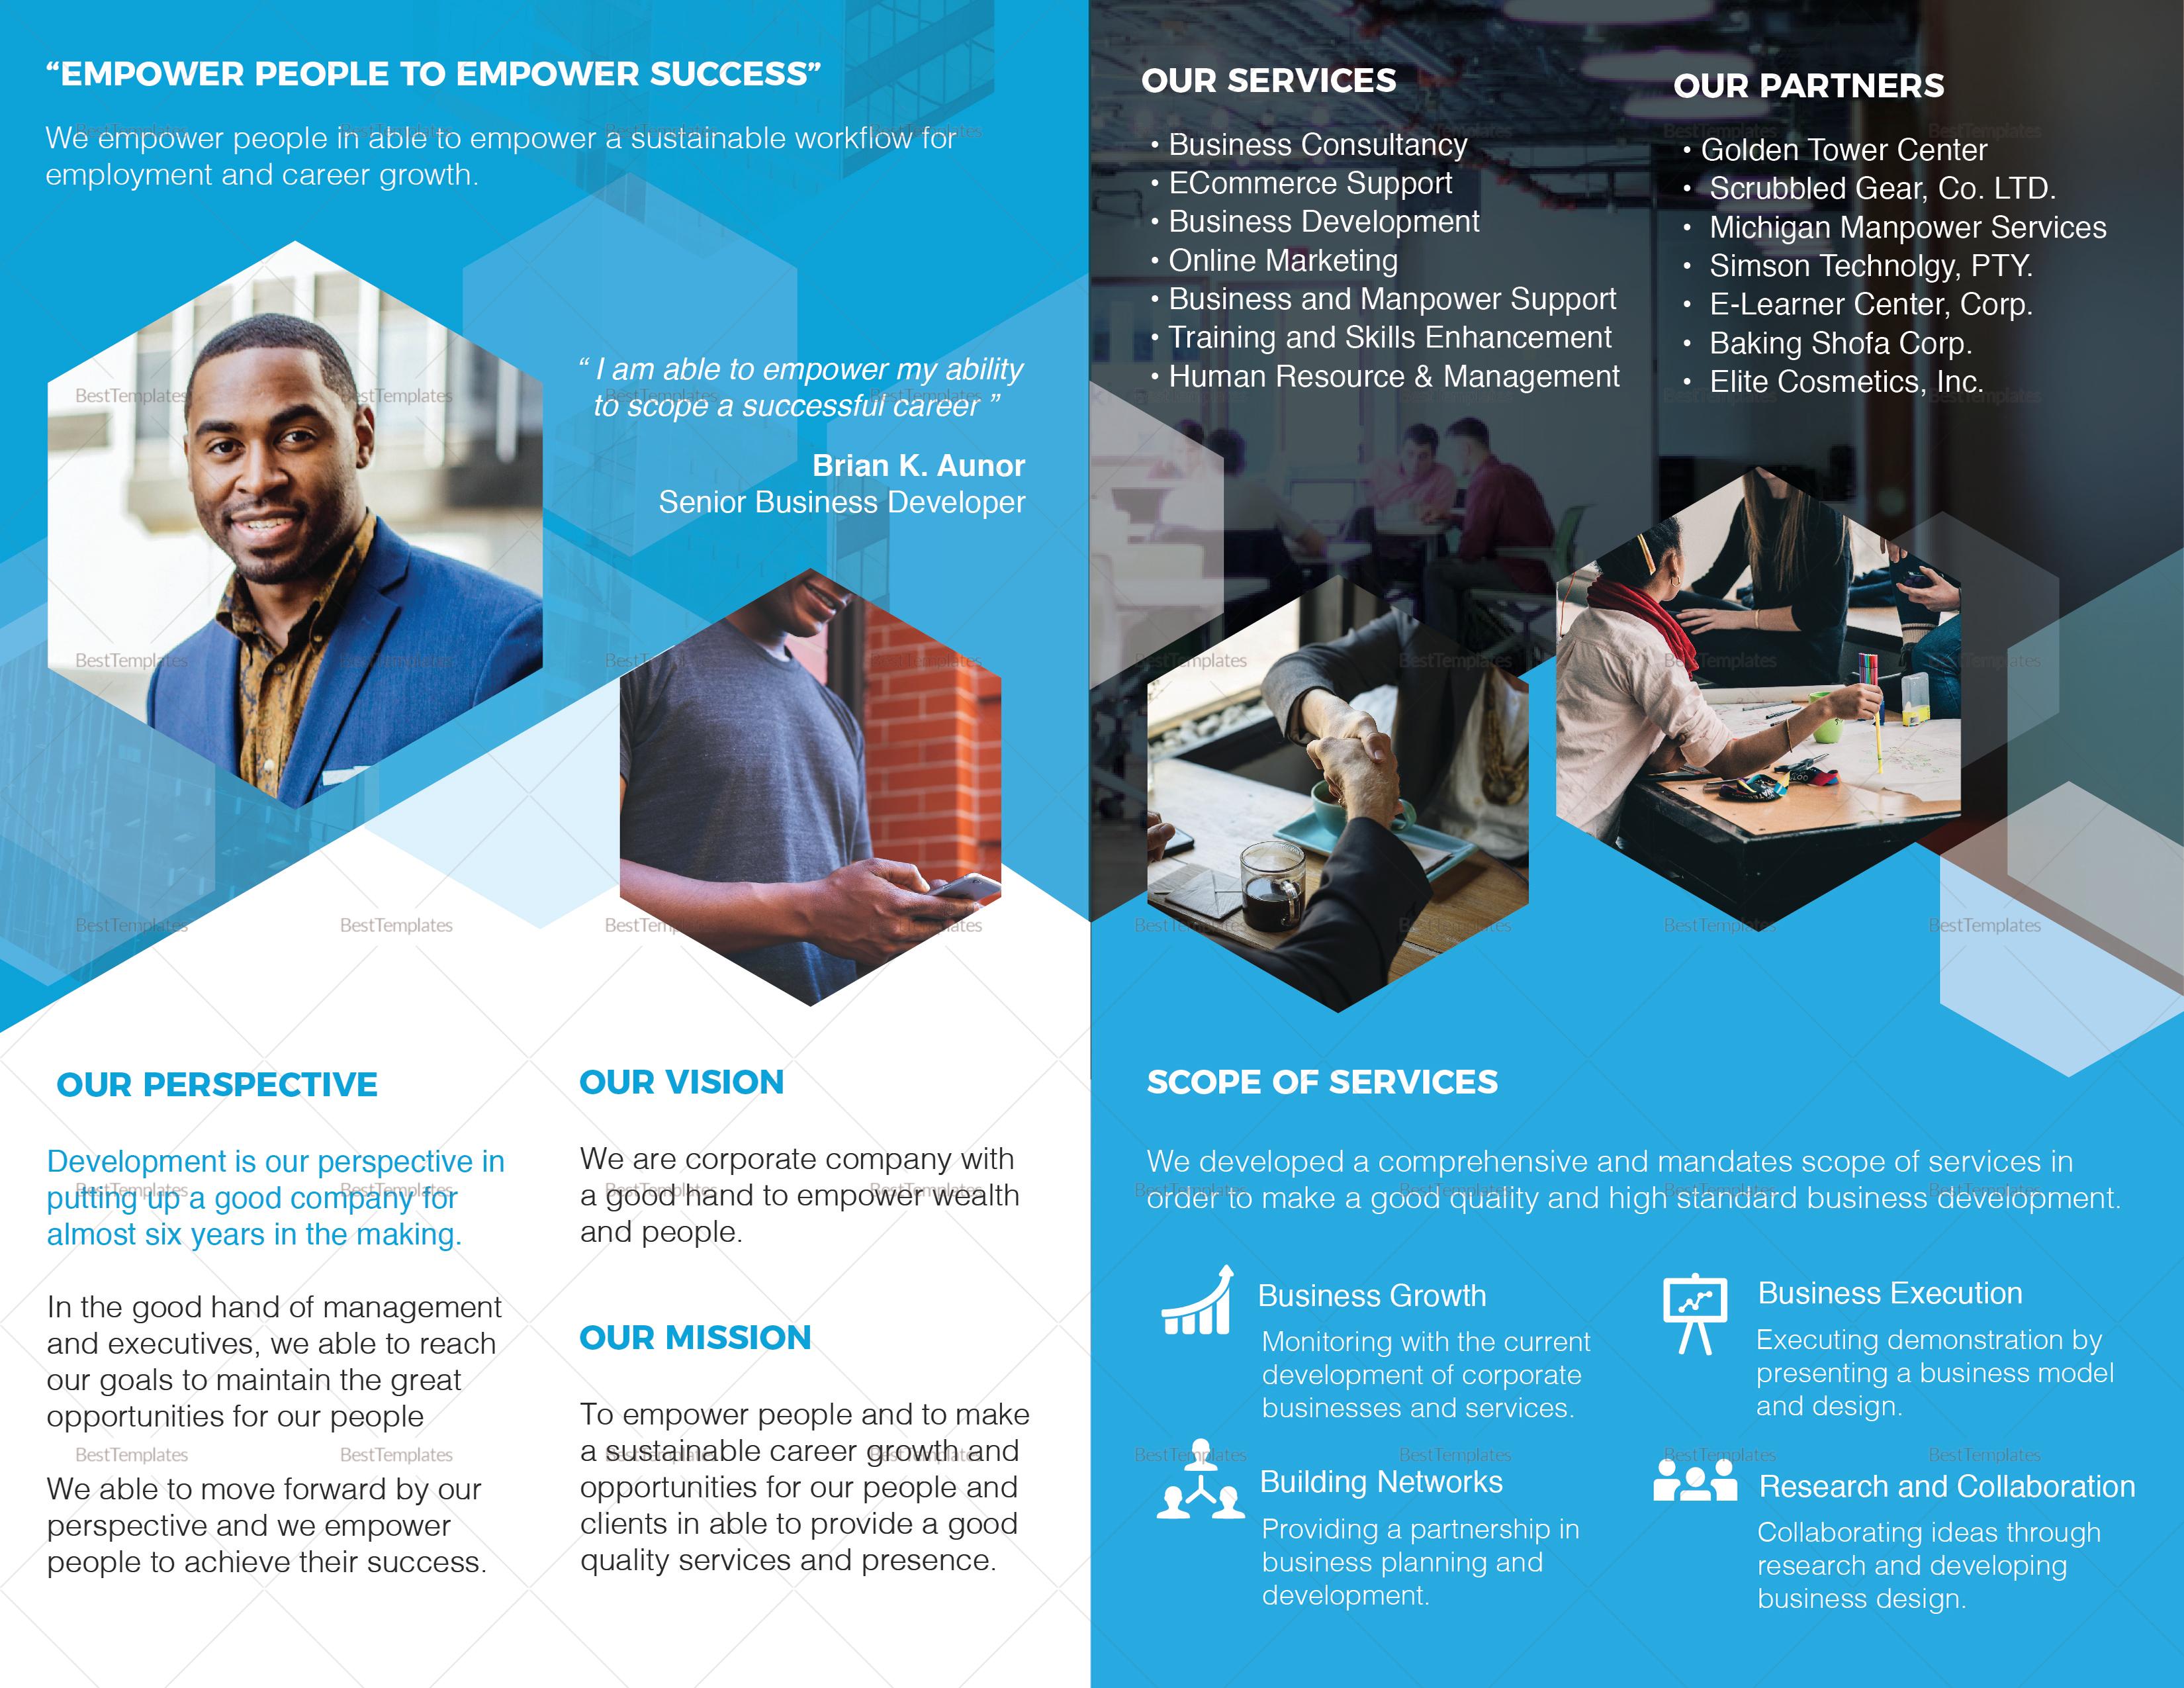 Company profile bi fold brochure design template in psd for Bi fold brochure template illustrator